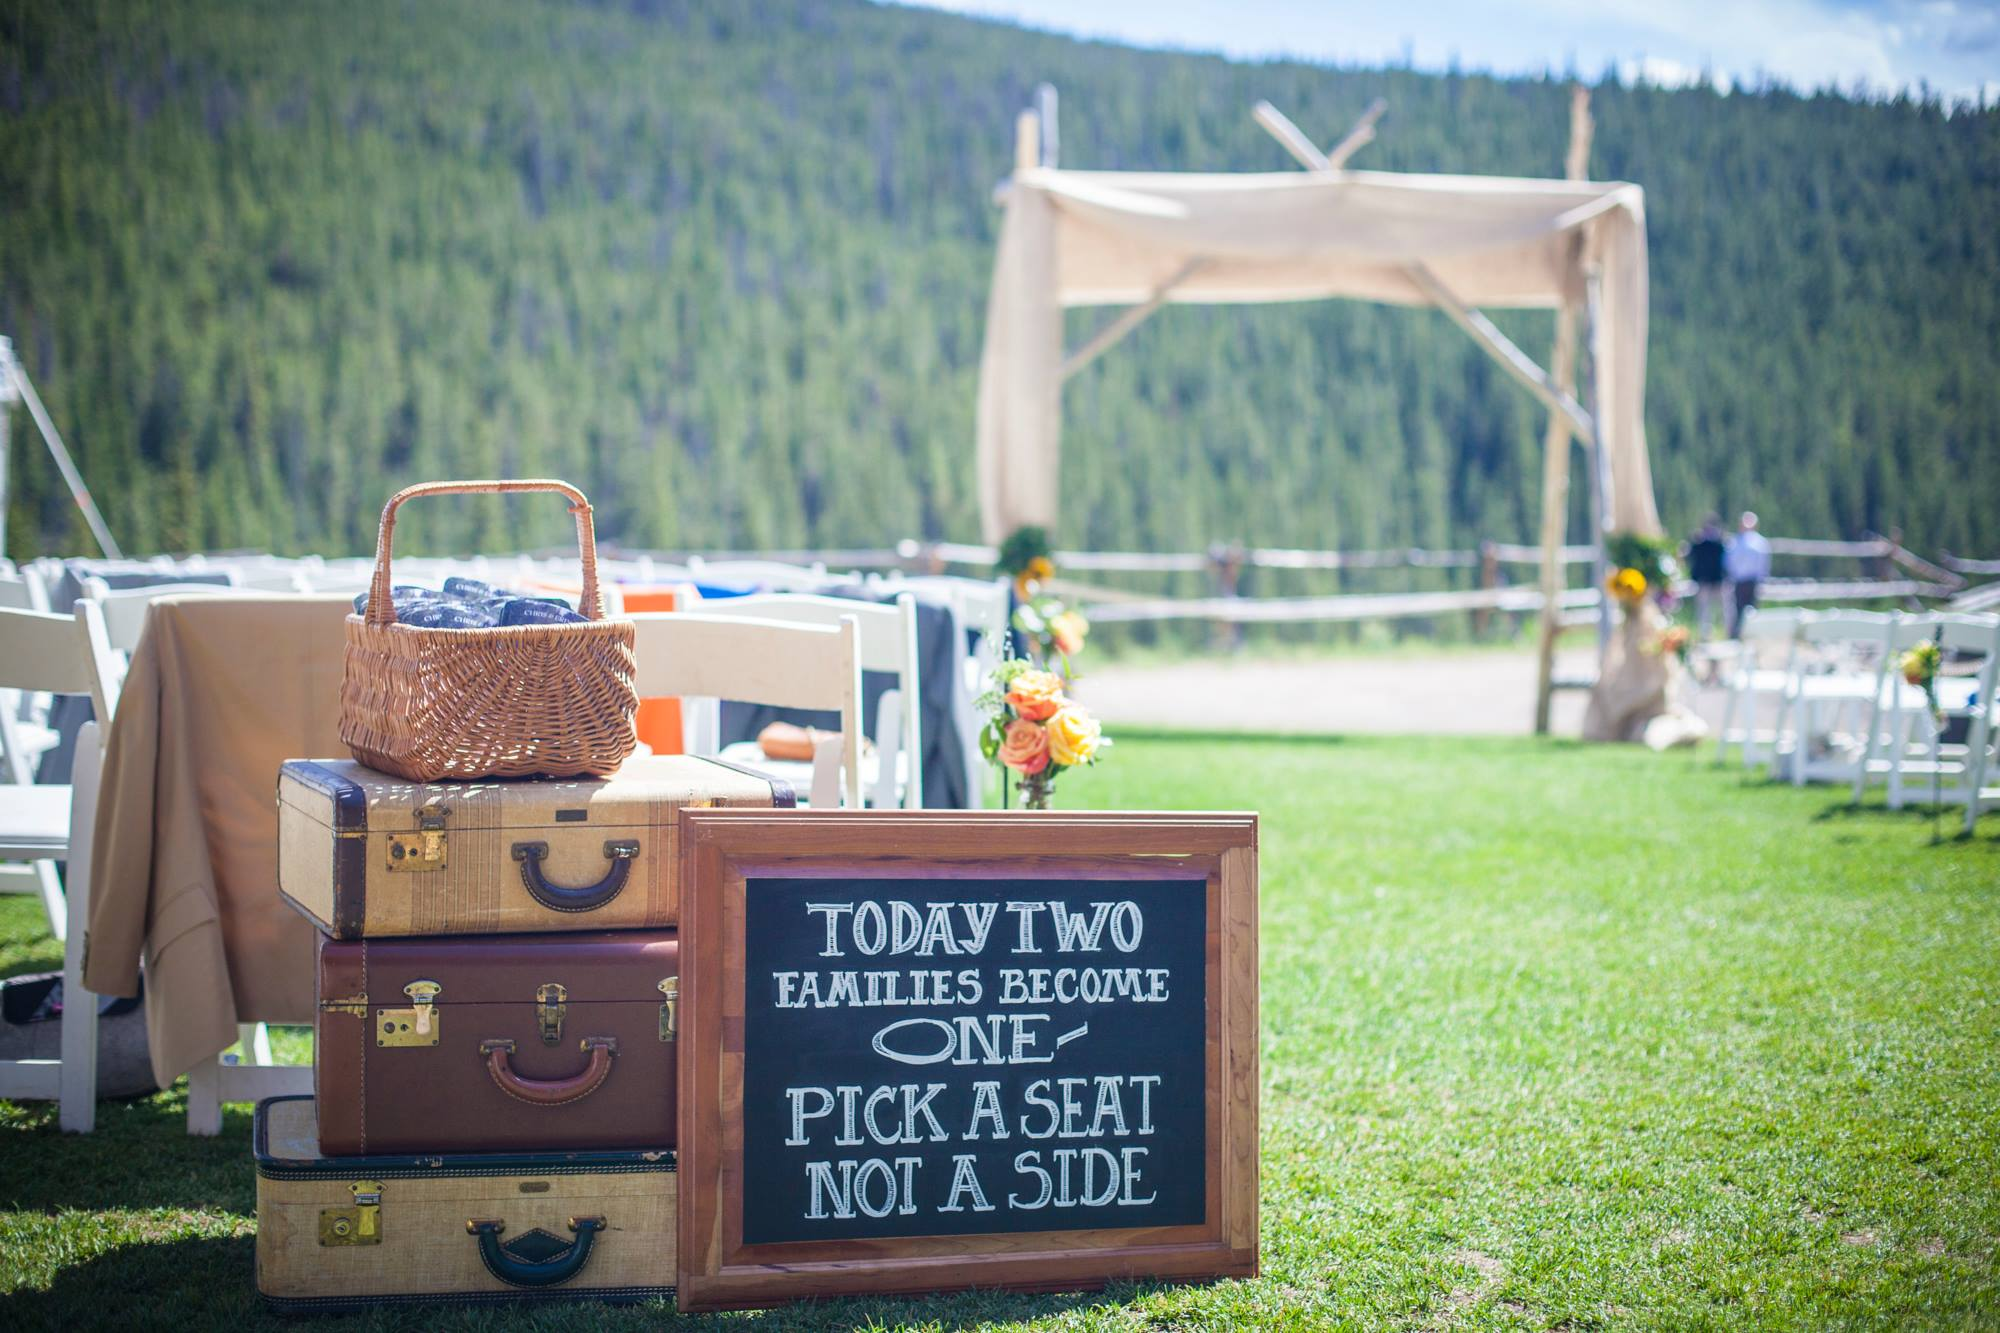 dry-gulch-placer-wedding-breckenridge-colorado-painter-ben-keys-live-wedding-artist